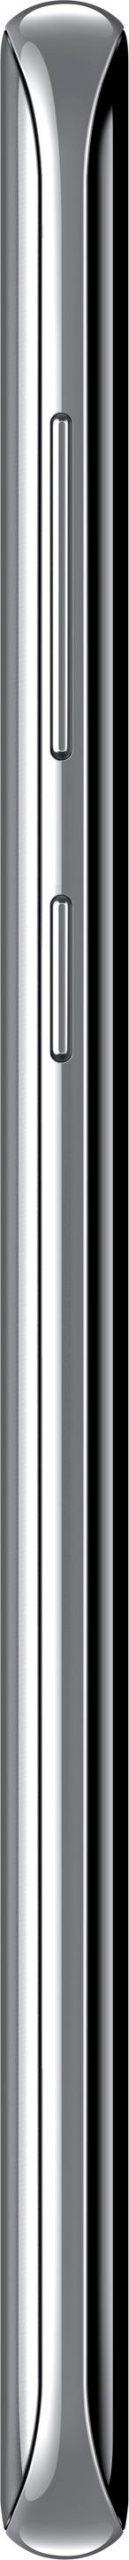 Samsung Galaxy S8+ DUAL (SM-G955) 359049085547432 - 3